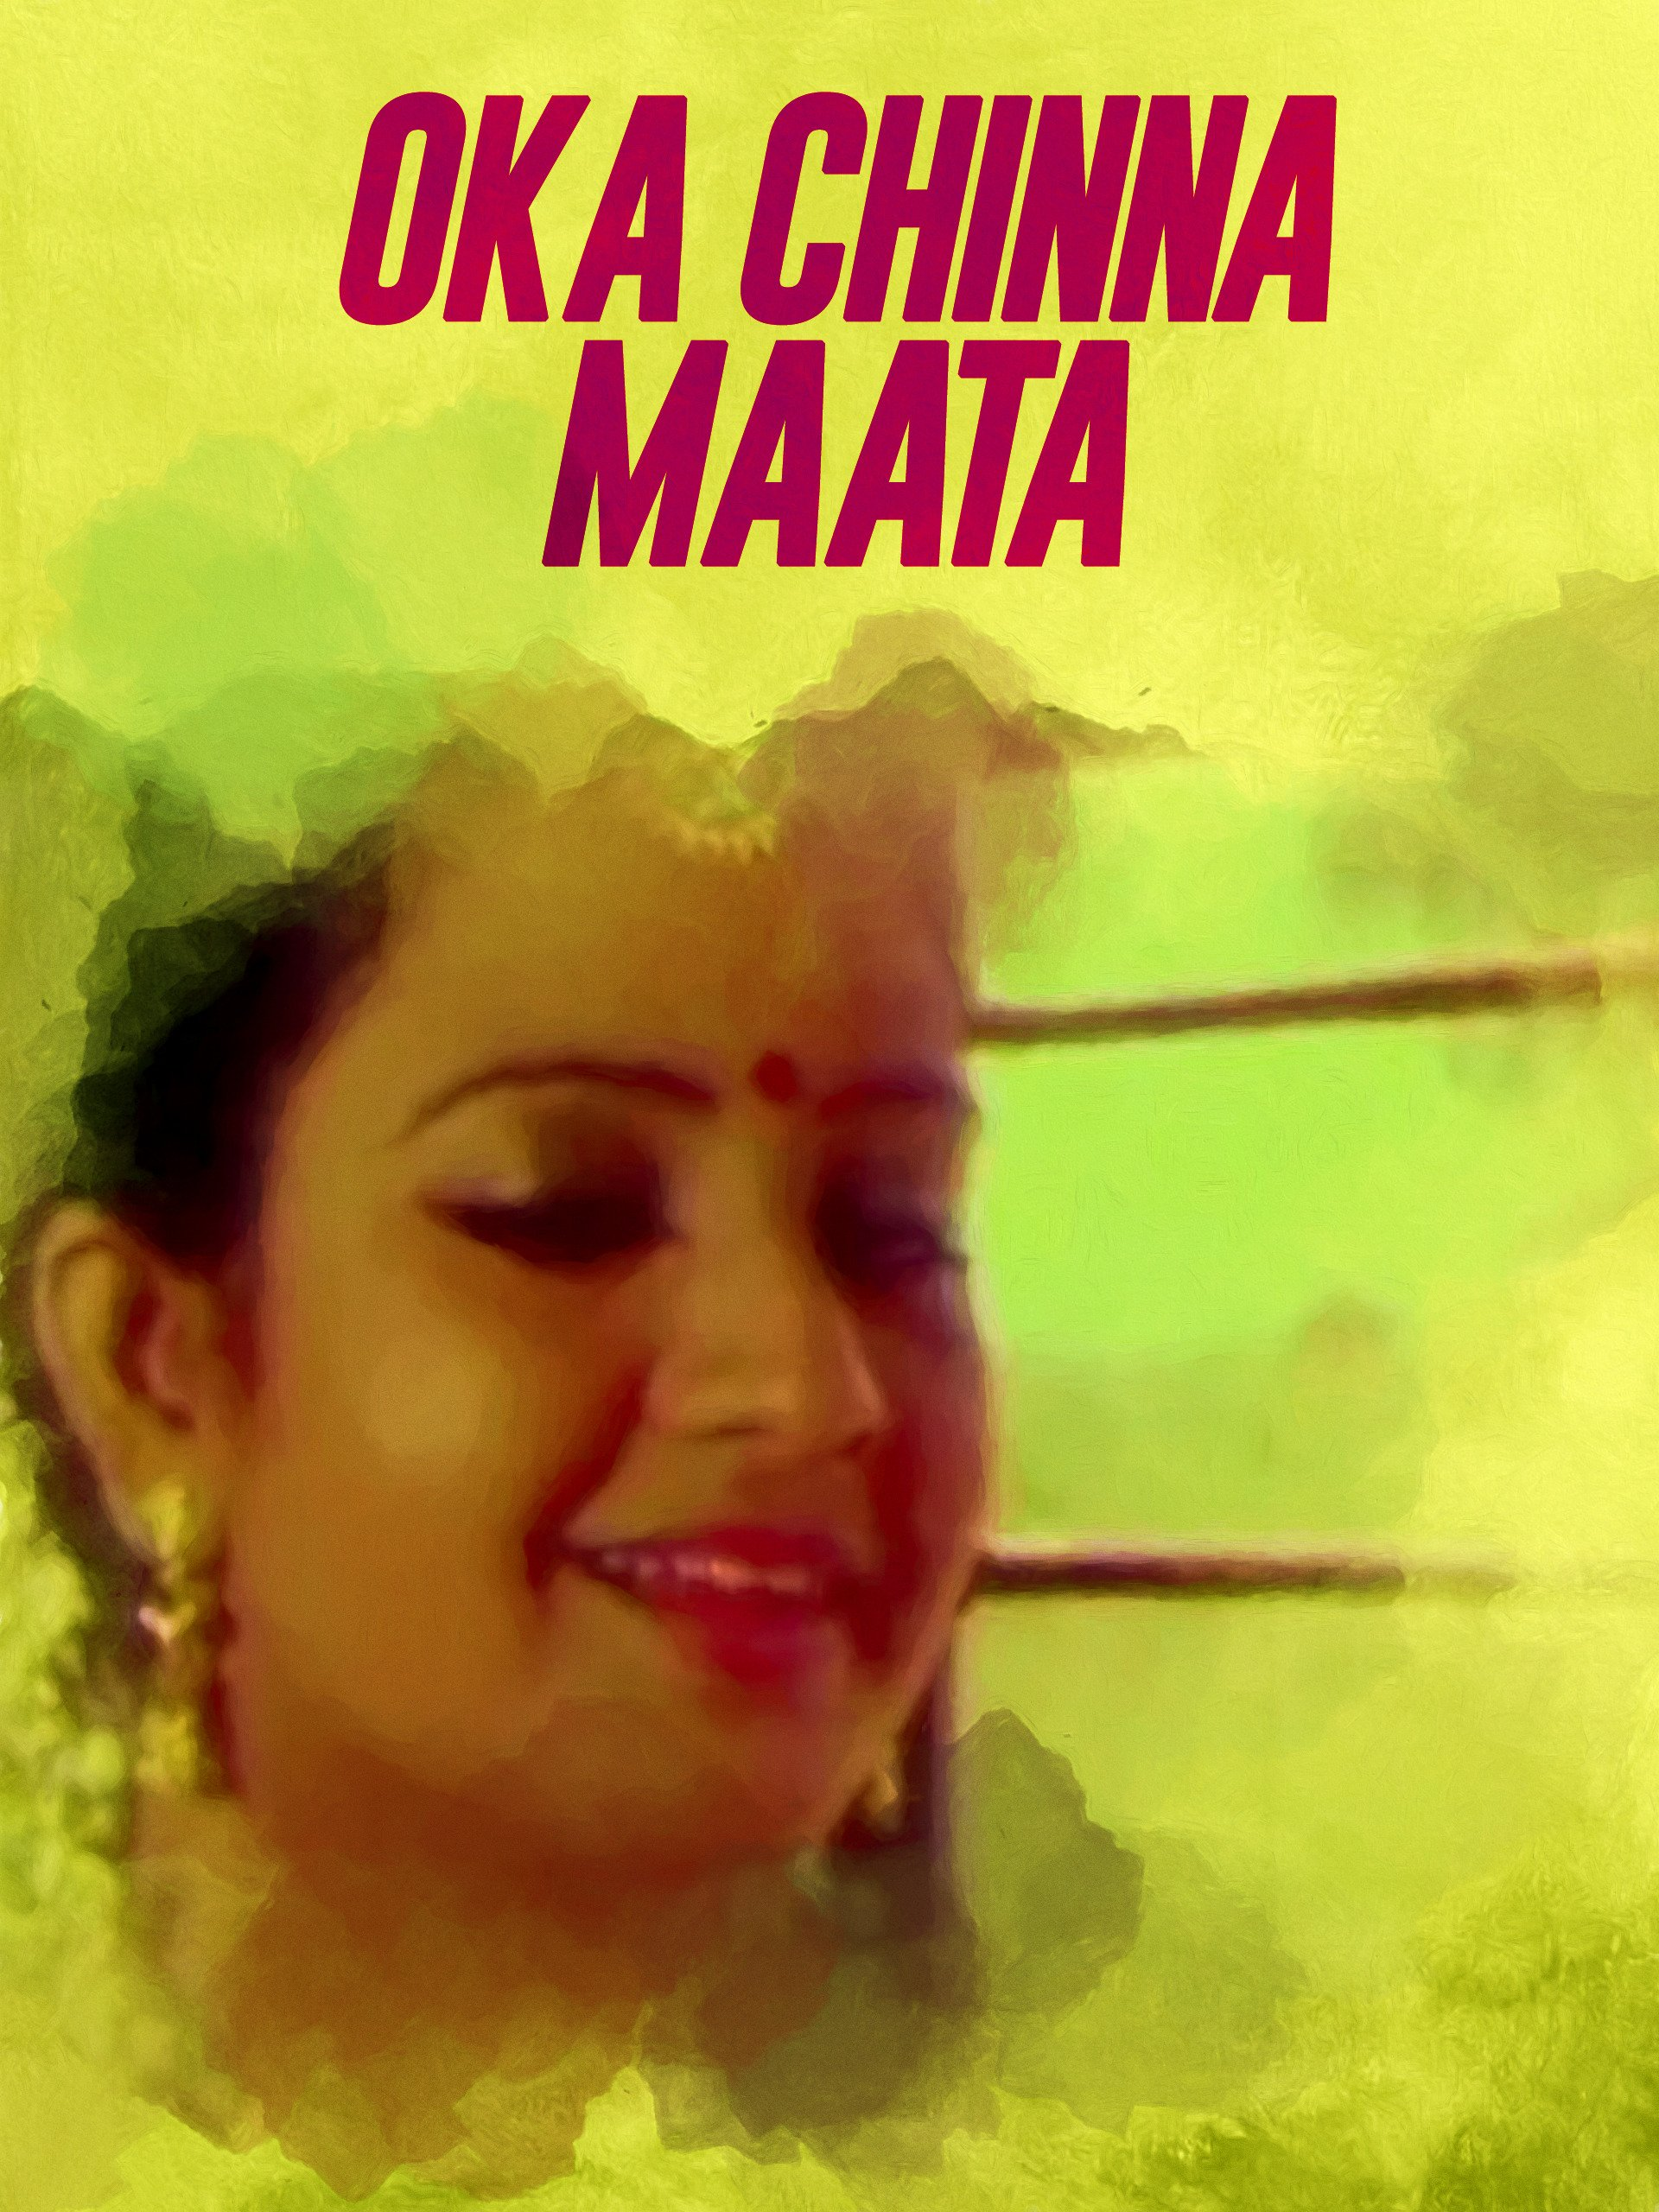 oka chinna maata telugu movie mp3 songs free download